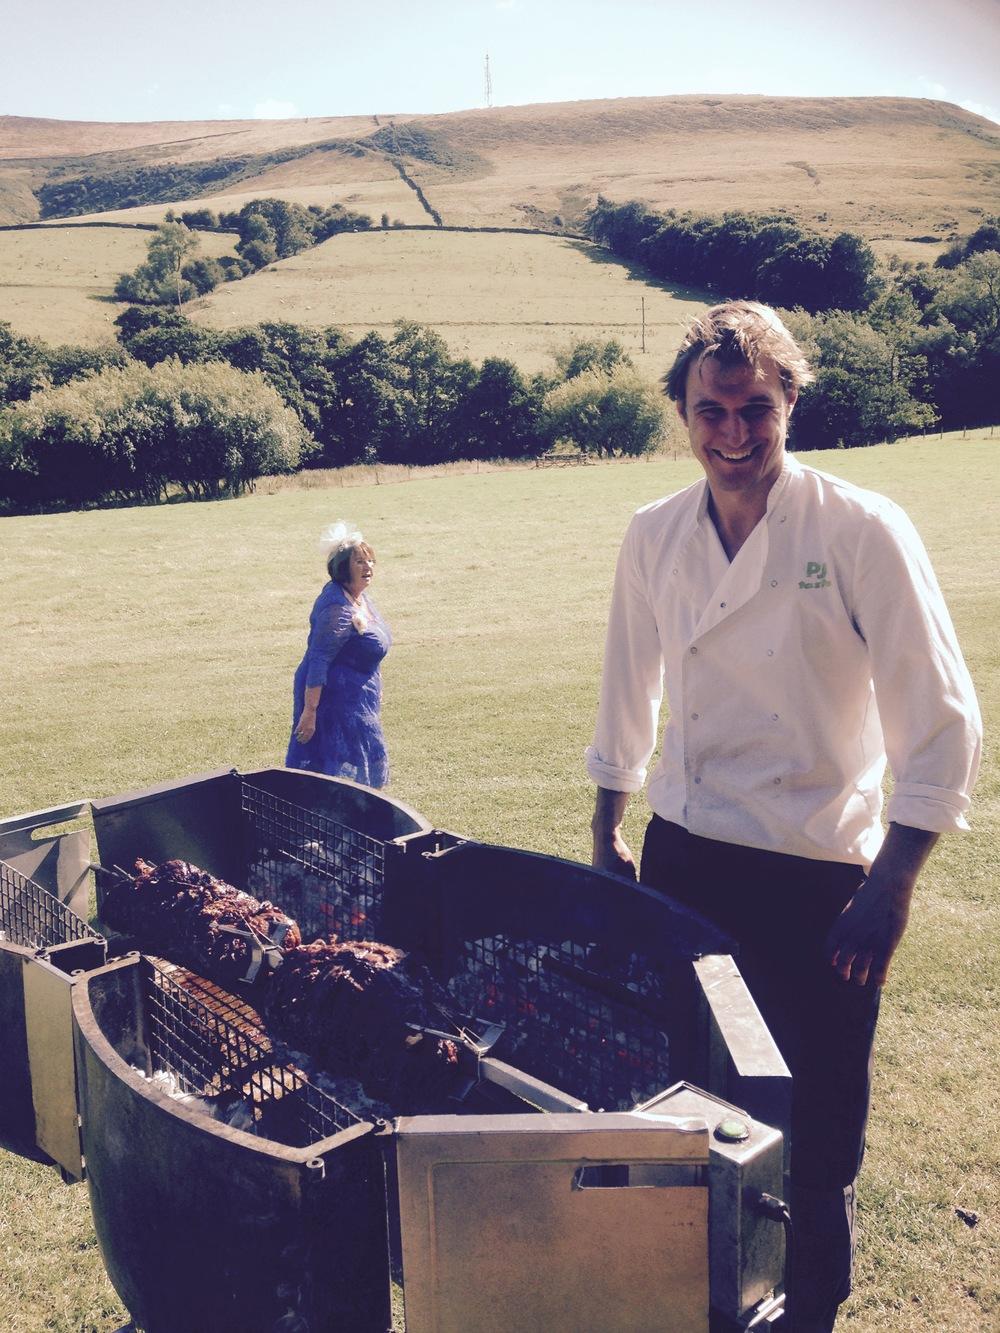 Lamb roast over charcoal